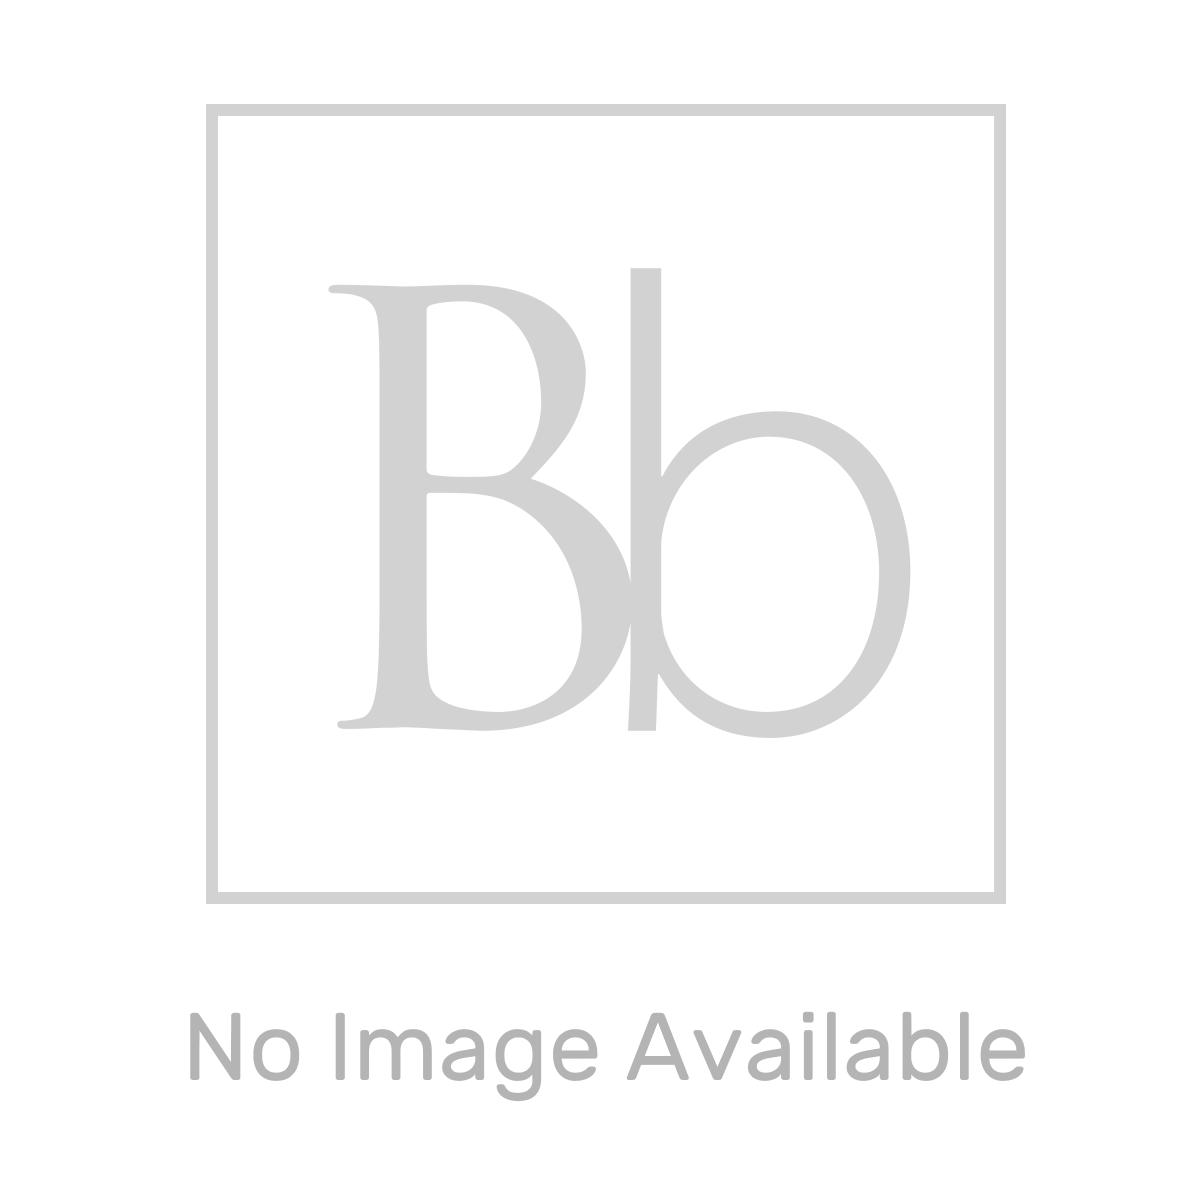 Aquadart Black Slate Shower Tray 1600 x 700